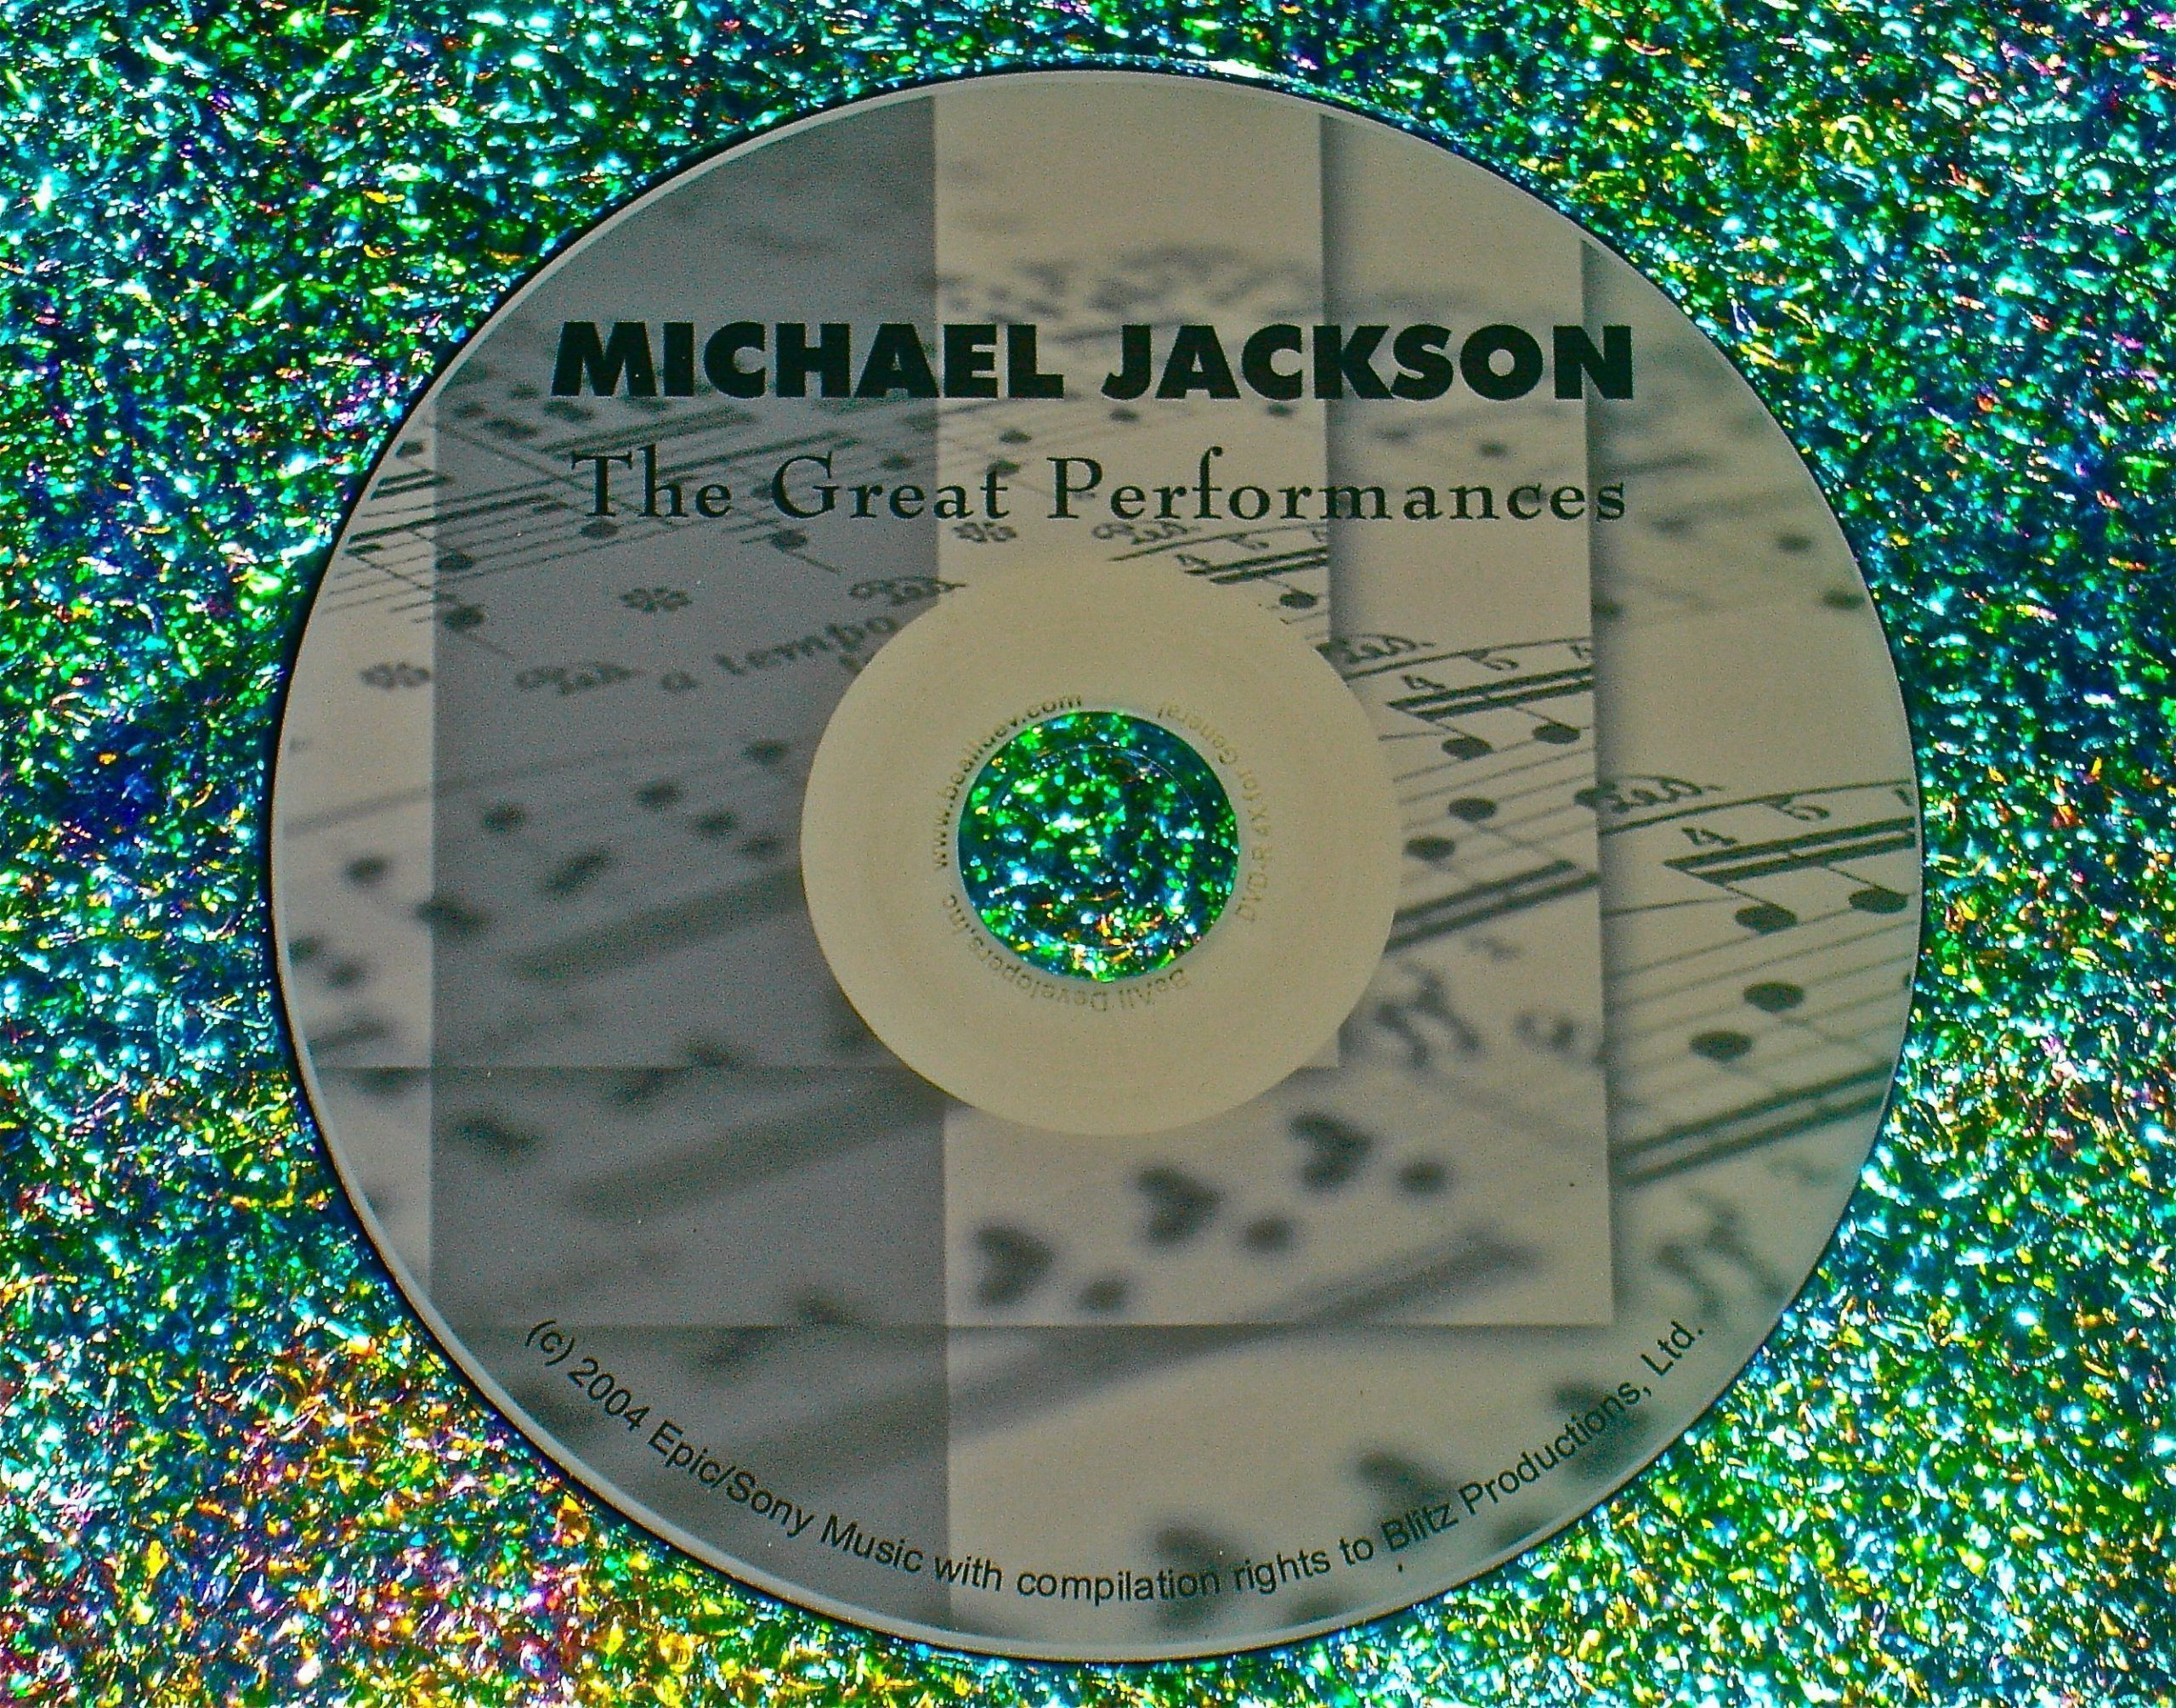 Michael Jackson Greatest Performances Archives 1988-1995 (2 Hrs.)